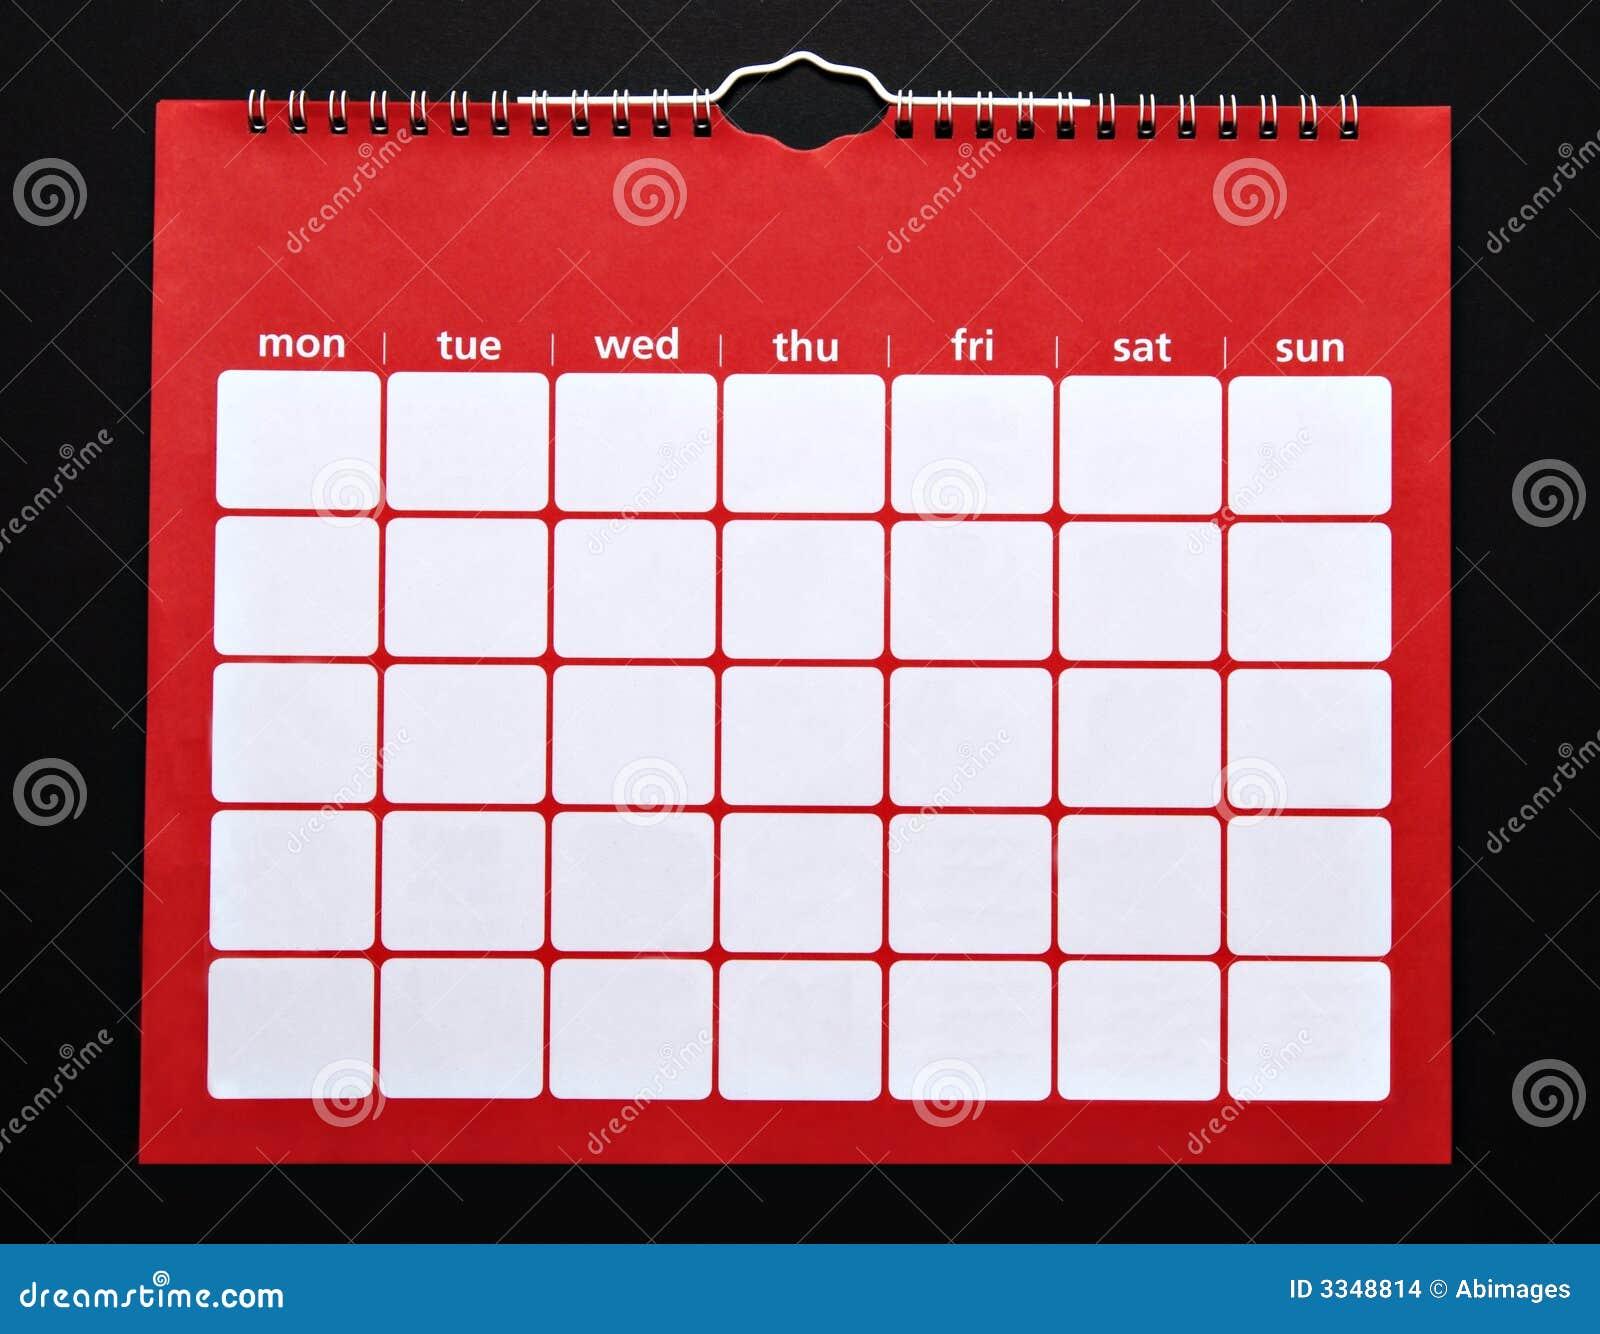 Blank Calendar No Numbers : Plain calendar stock images image